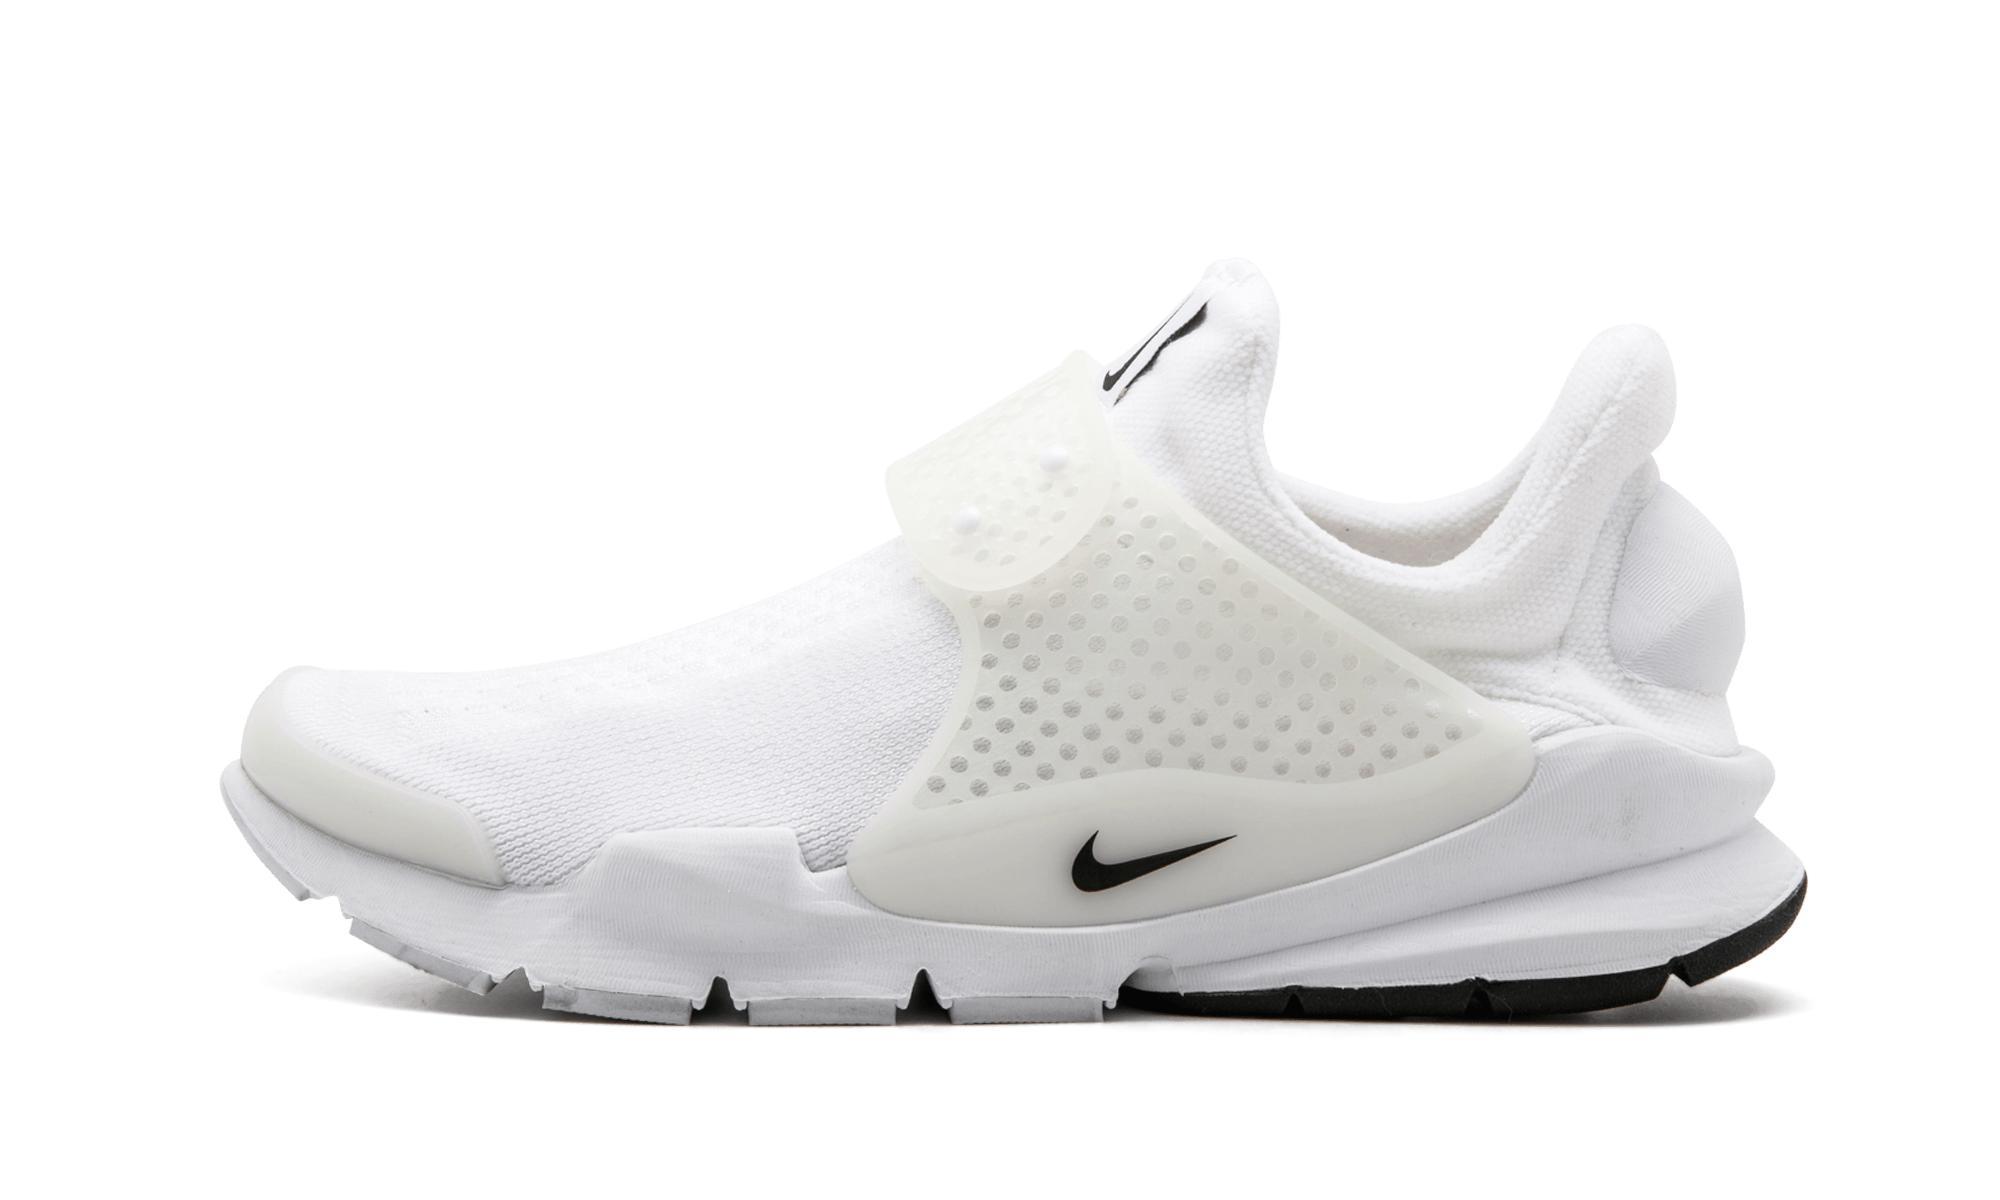 detailed look 6ba6a 5eee4 Nike. Women s White Sock Dart Sp